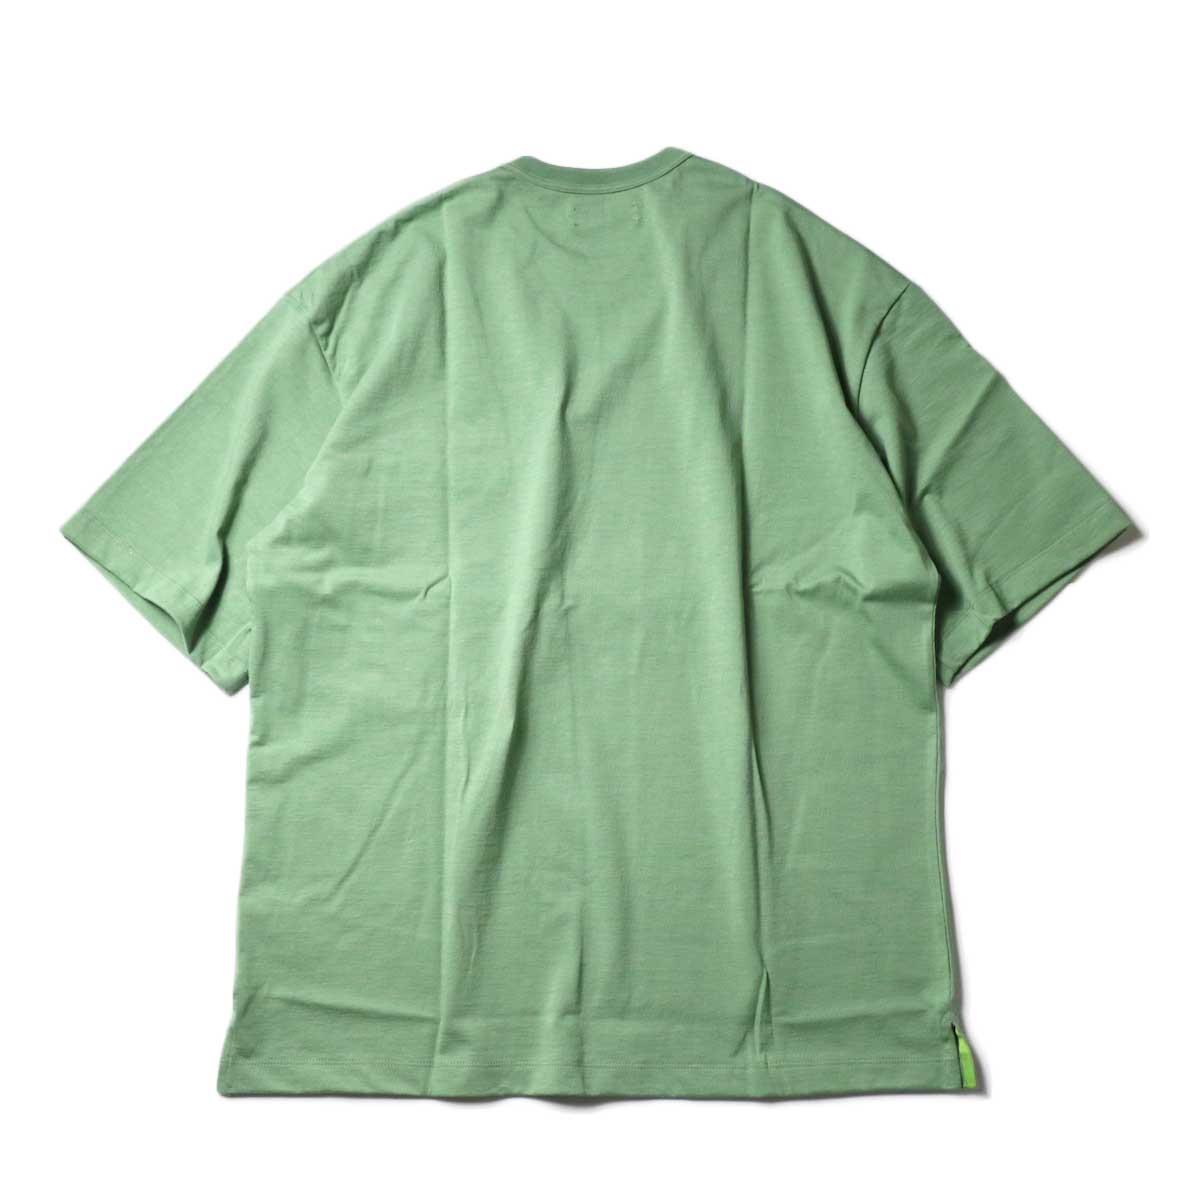 alvana / Tanguis Wide Pocket Tee (Forest Green)背面